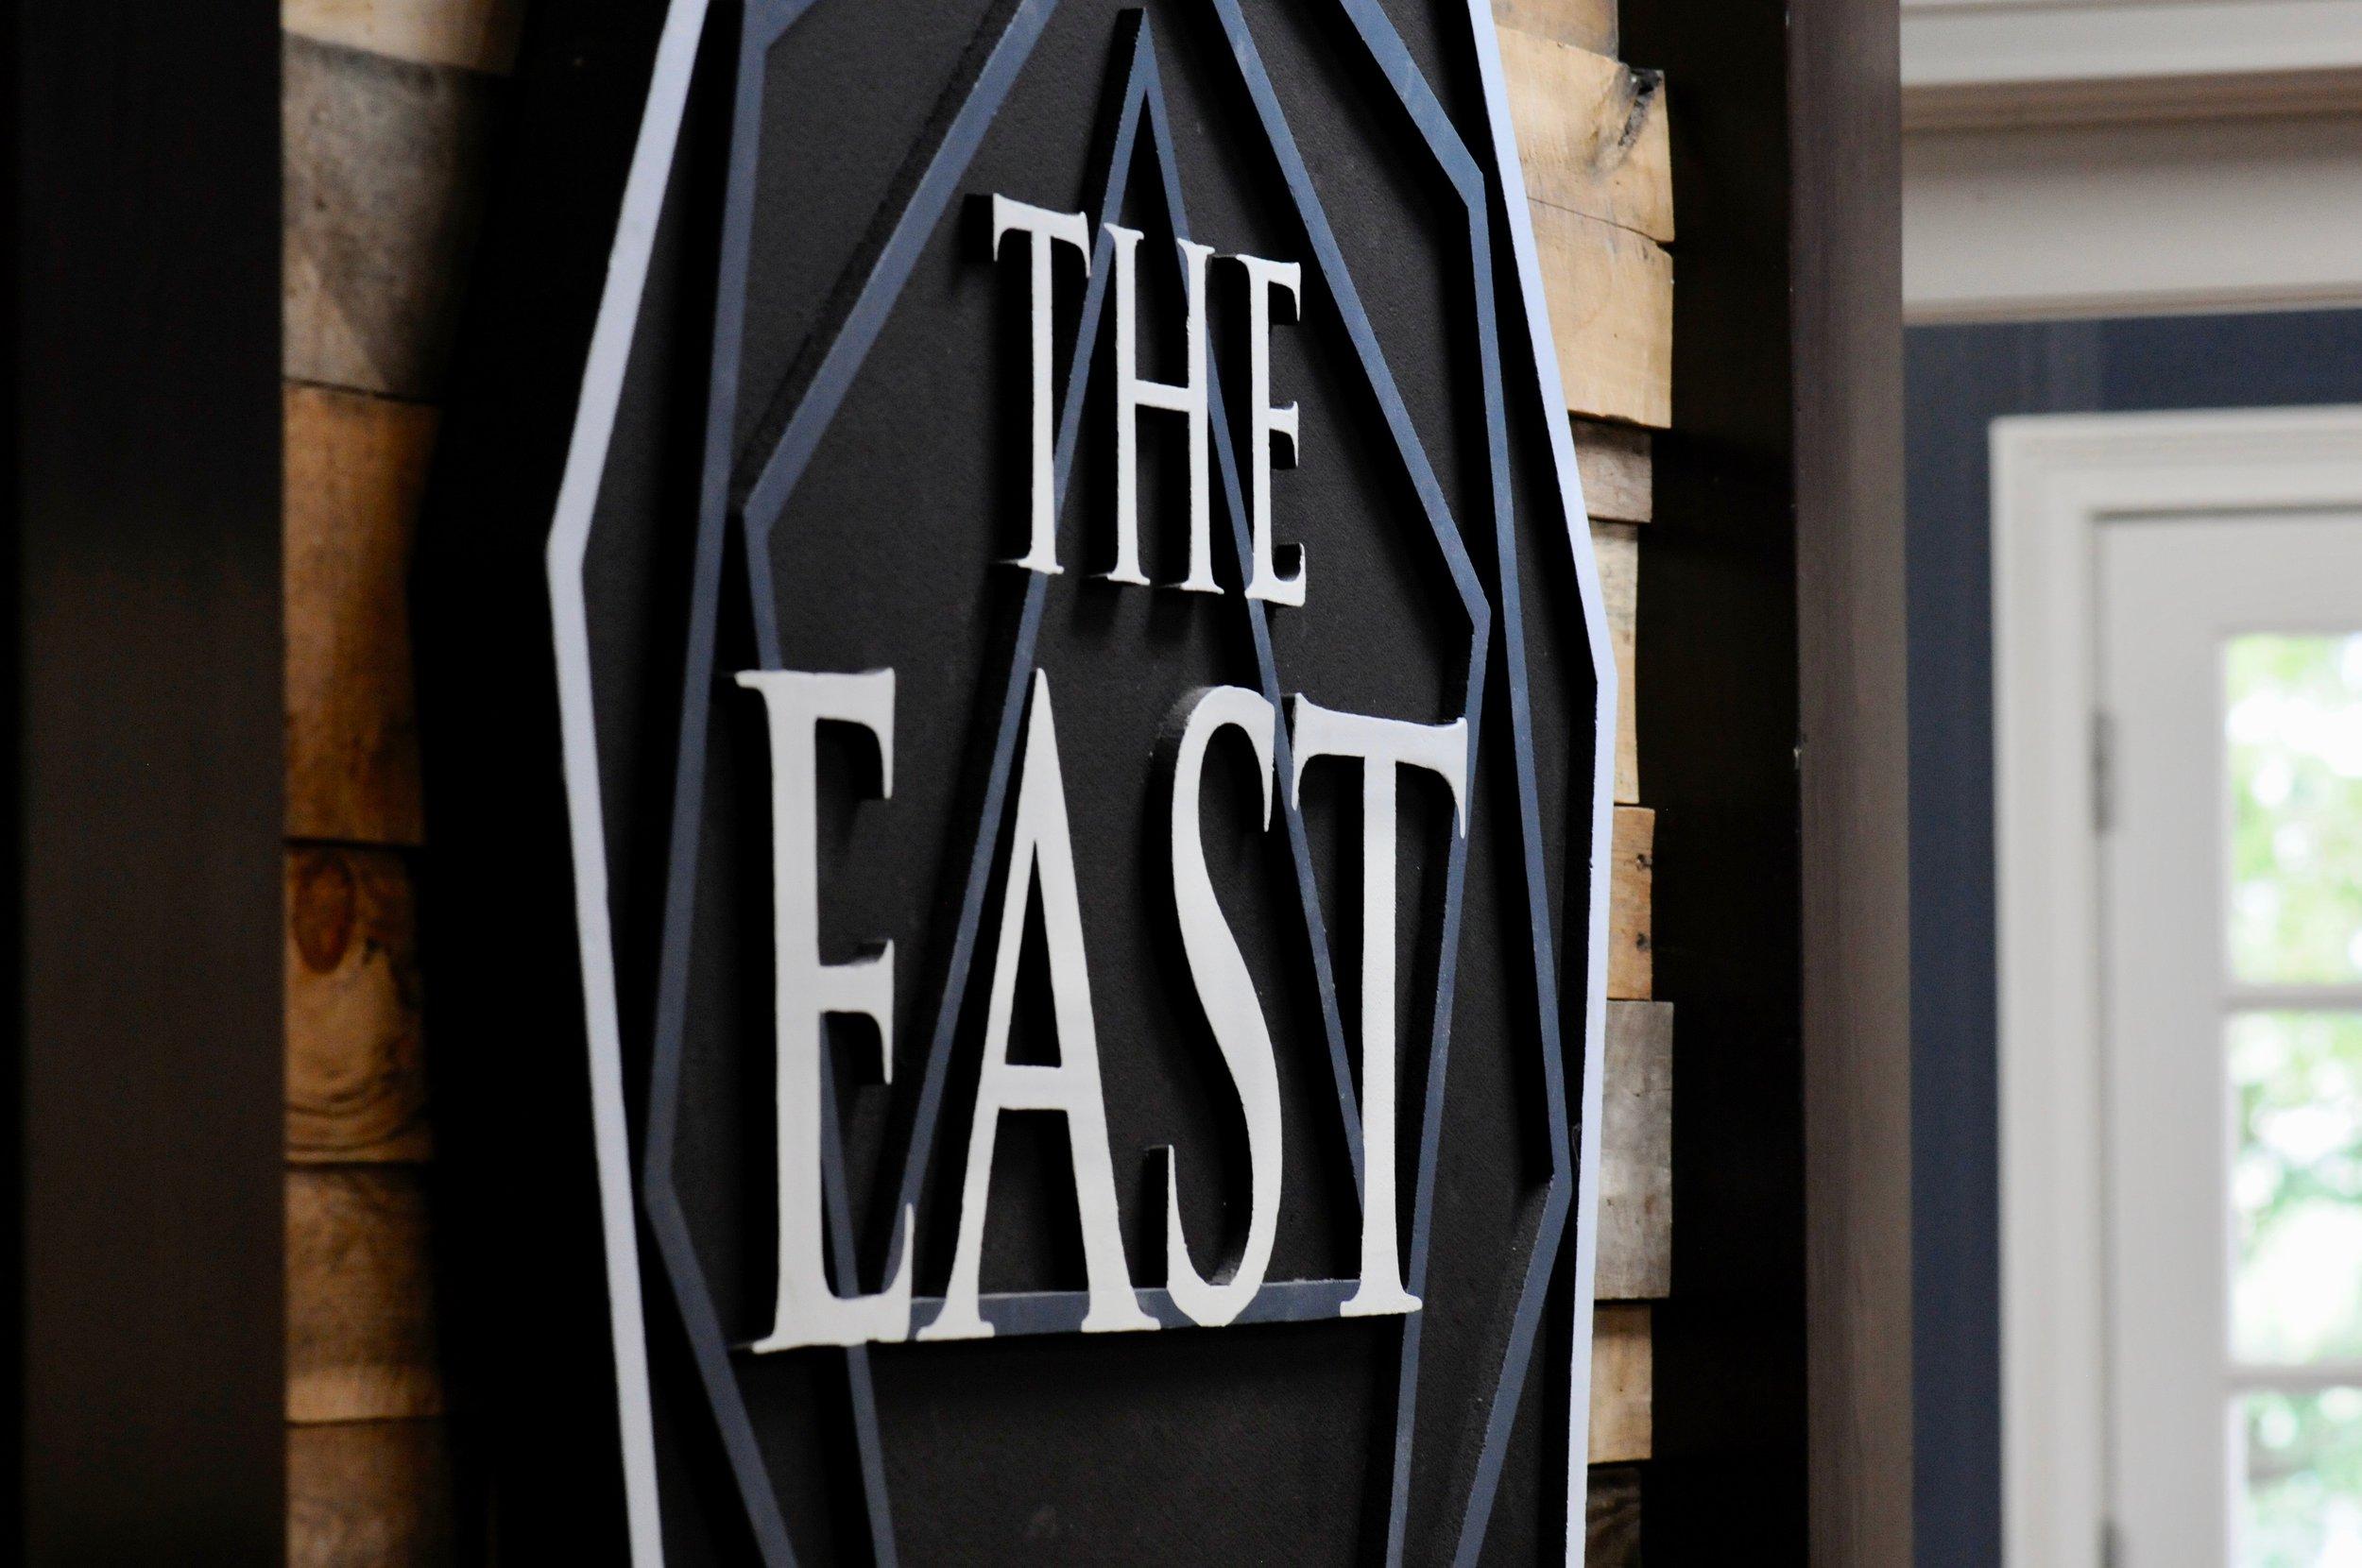 the-east-tattoo---salon-design_42867108310_o.jpg